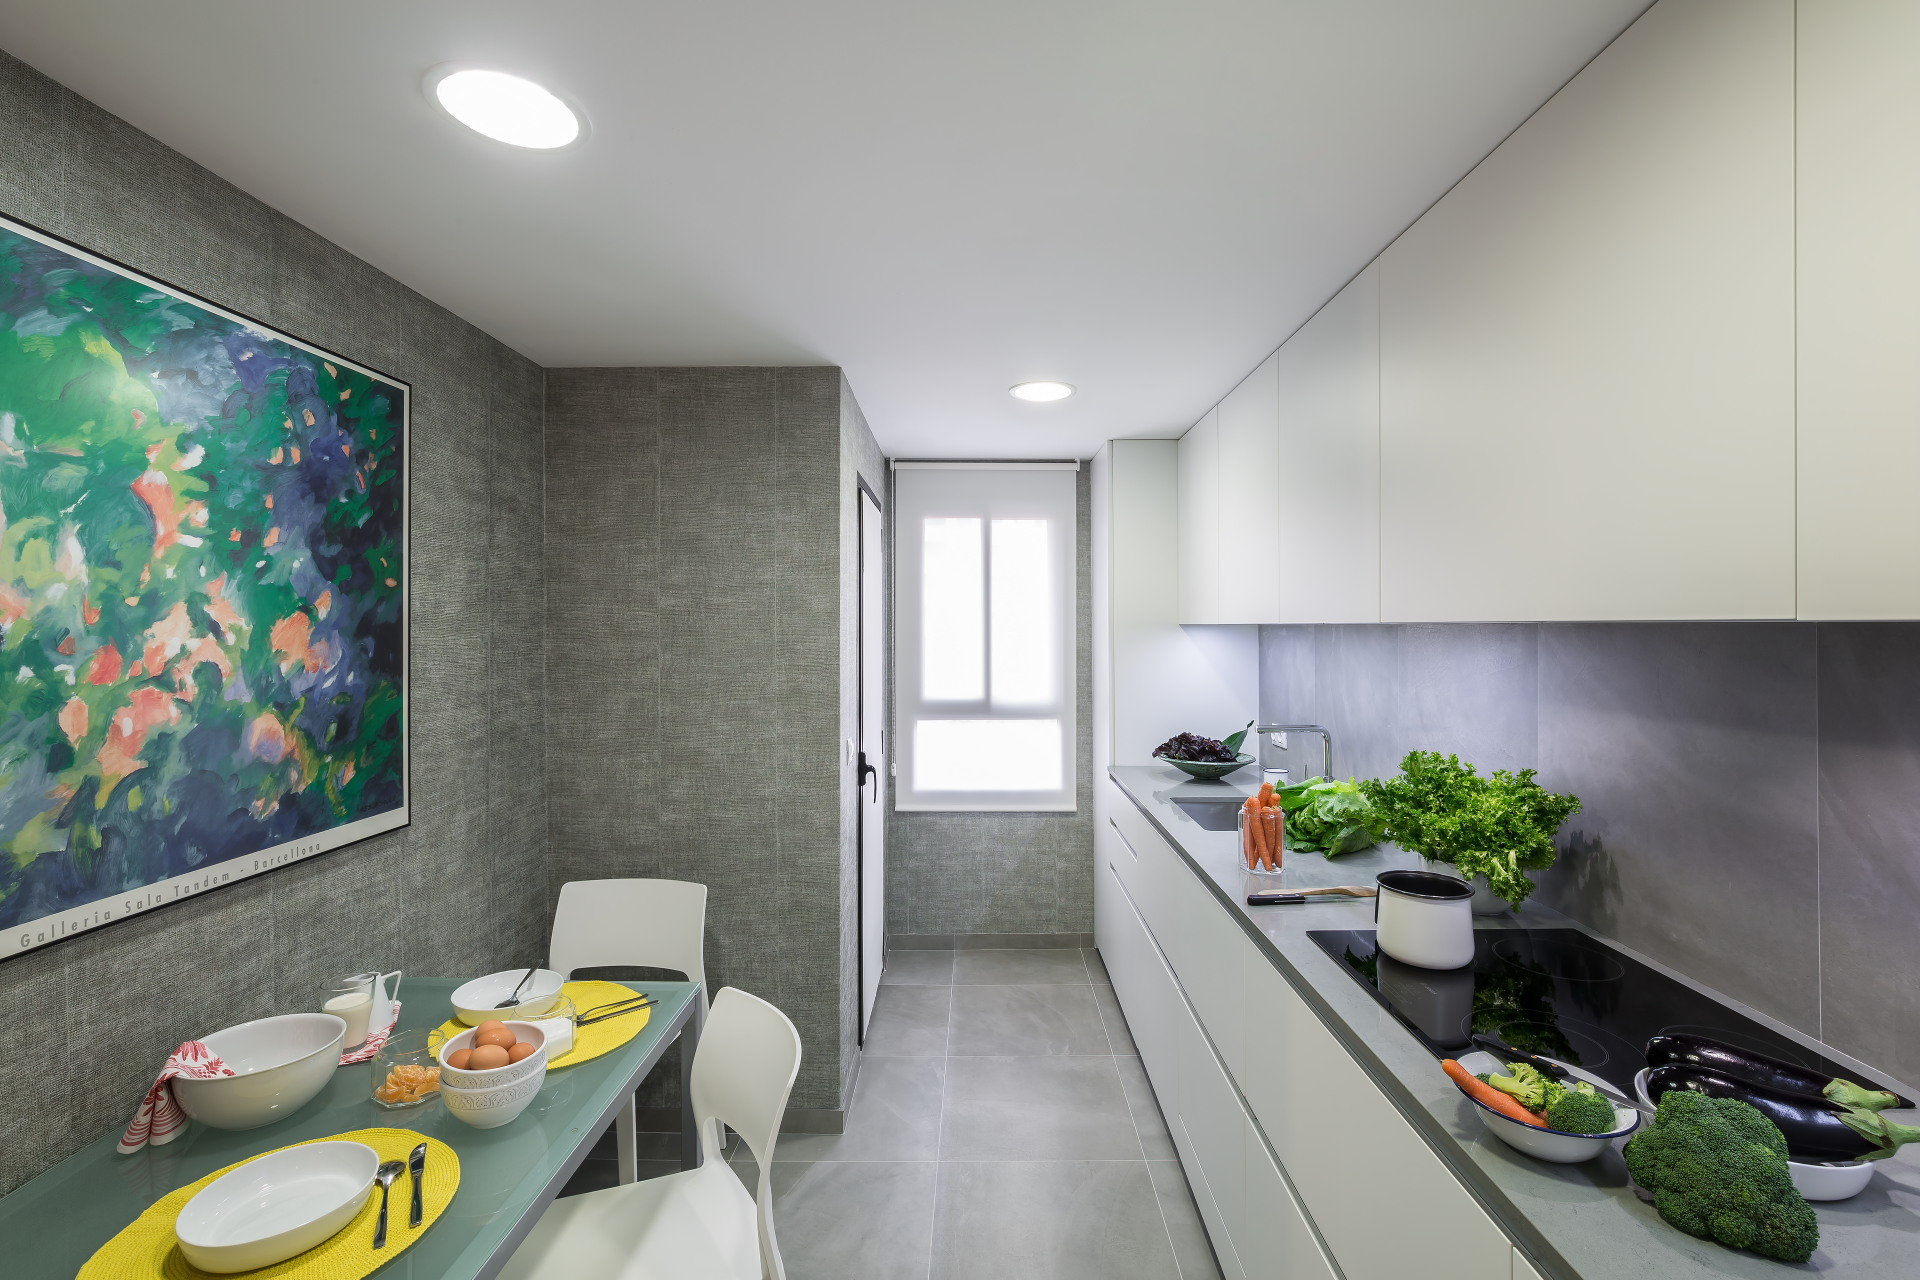 fotografia-arquitectura-interiorismo-valencia-german-cabo-laura-yerpes-mandas (16)